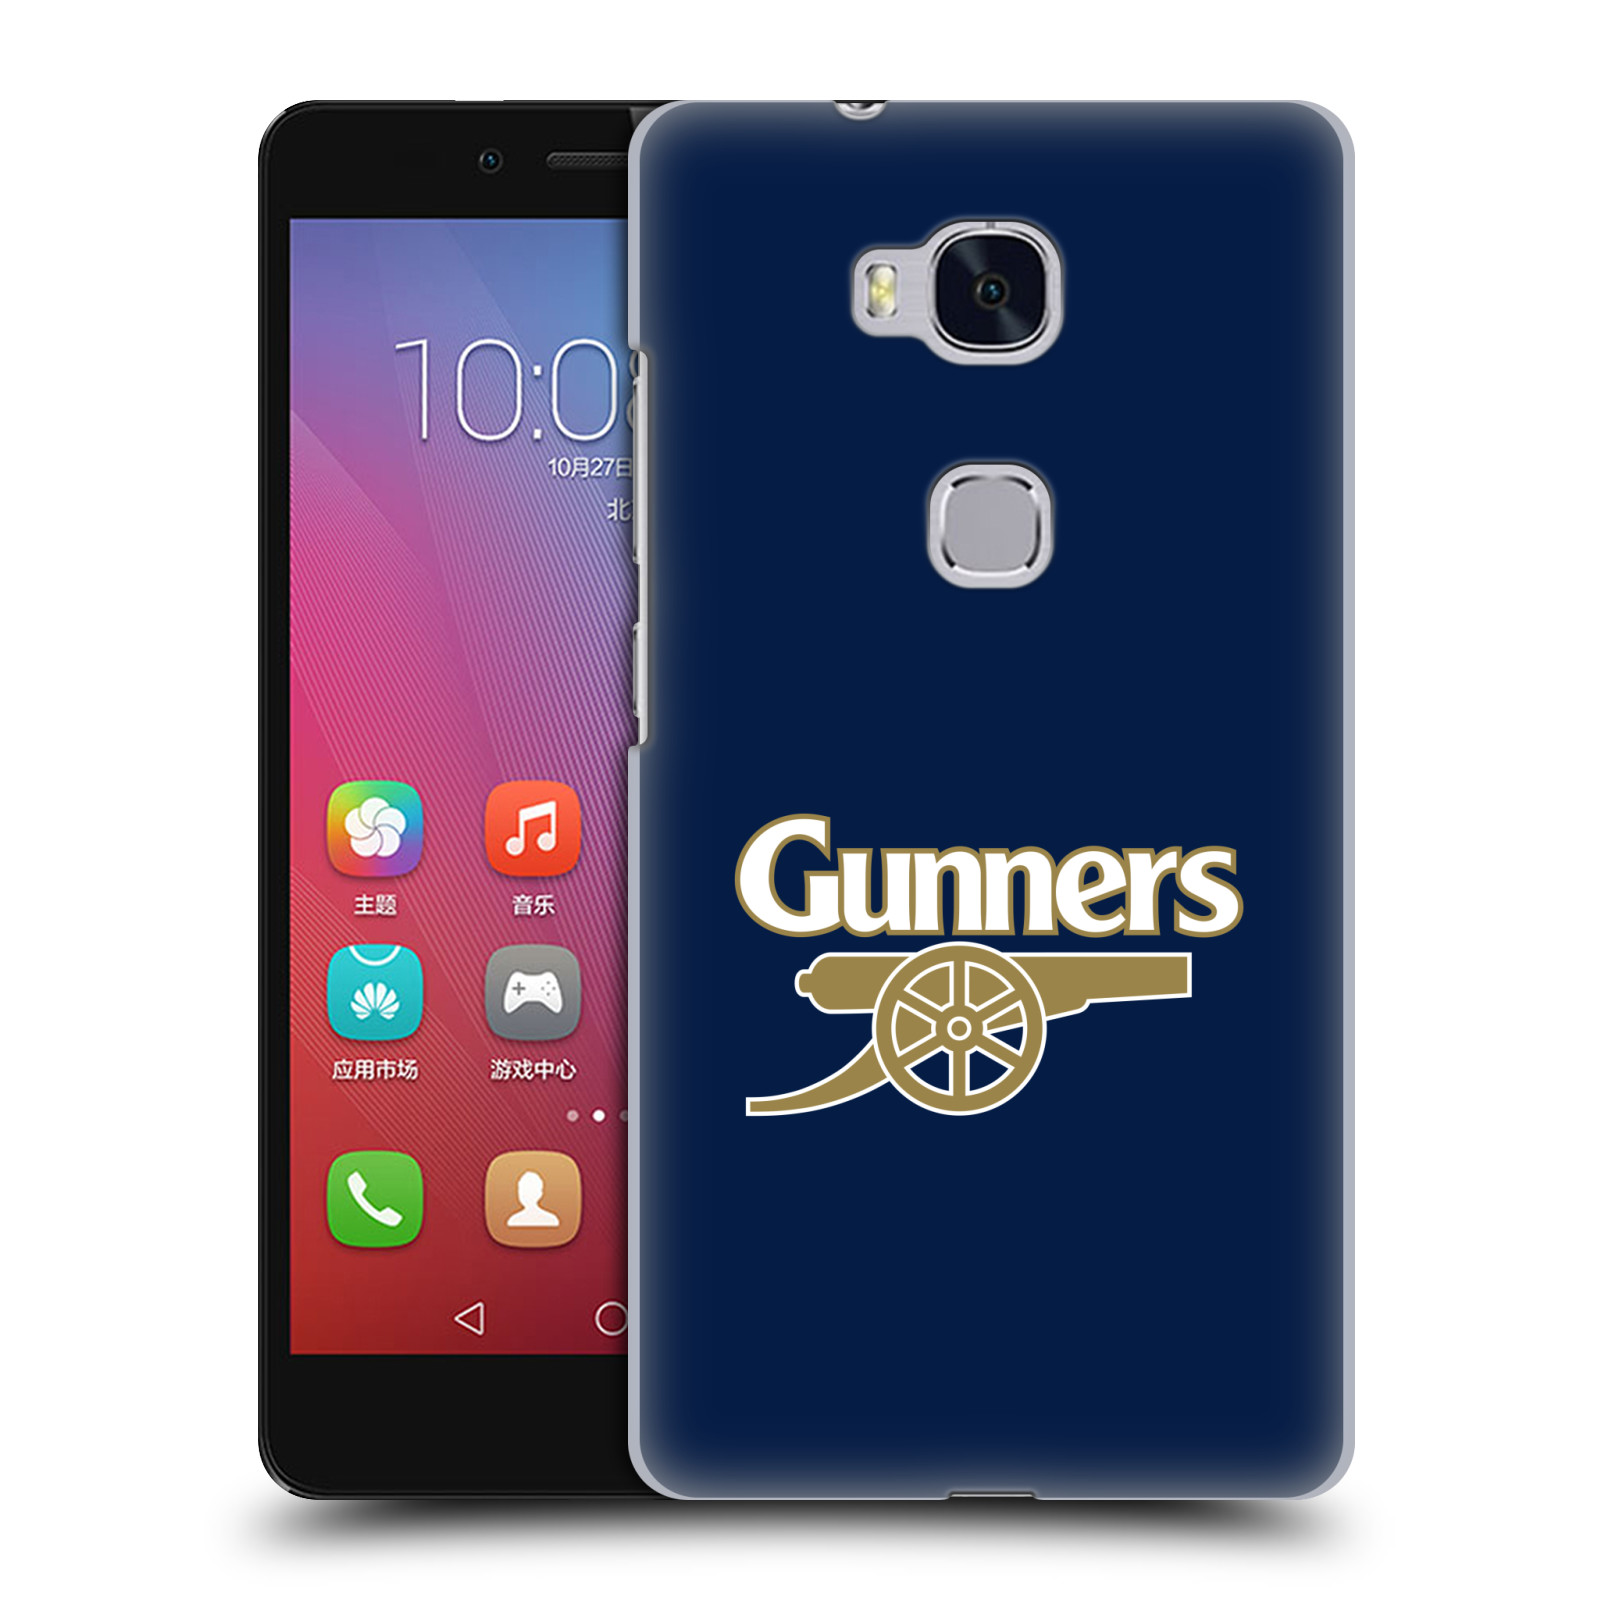 Plastové pouzdro na mobil Honor 5X - Head Case - Arsenal FC - Gunners